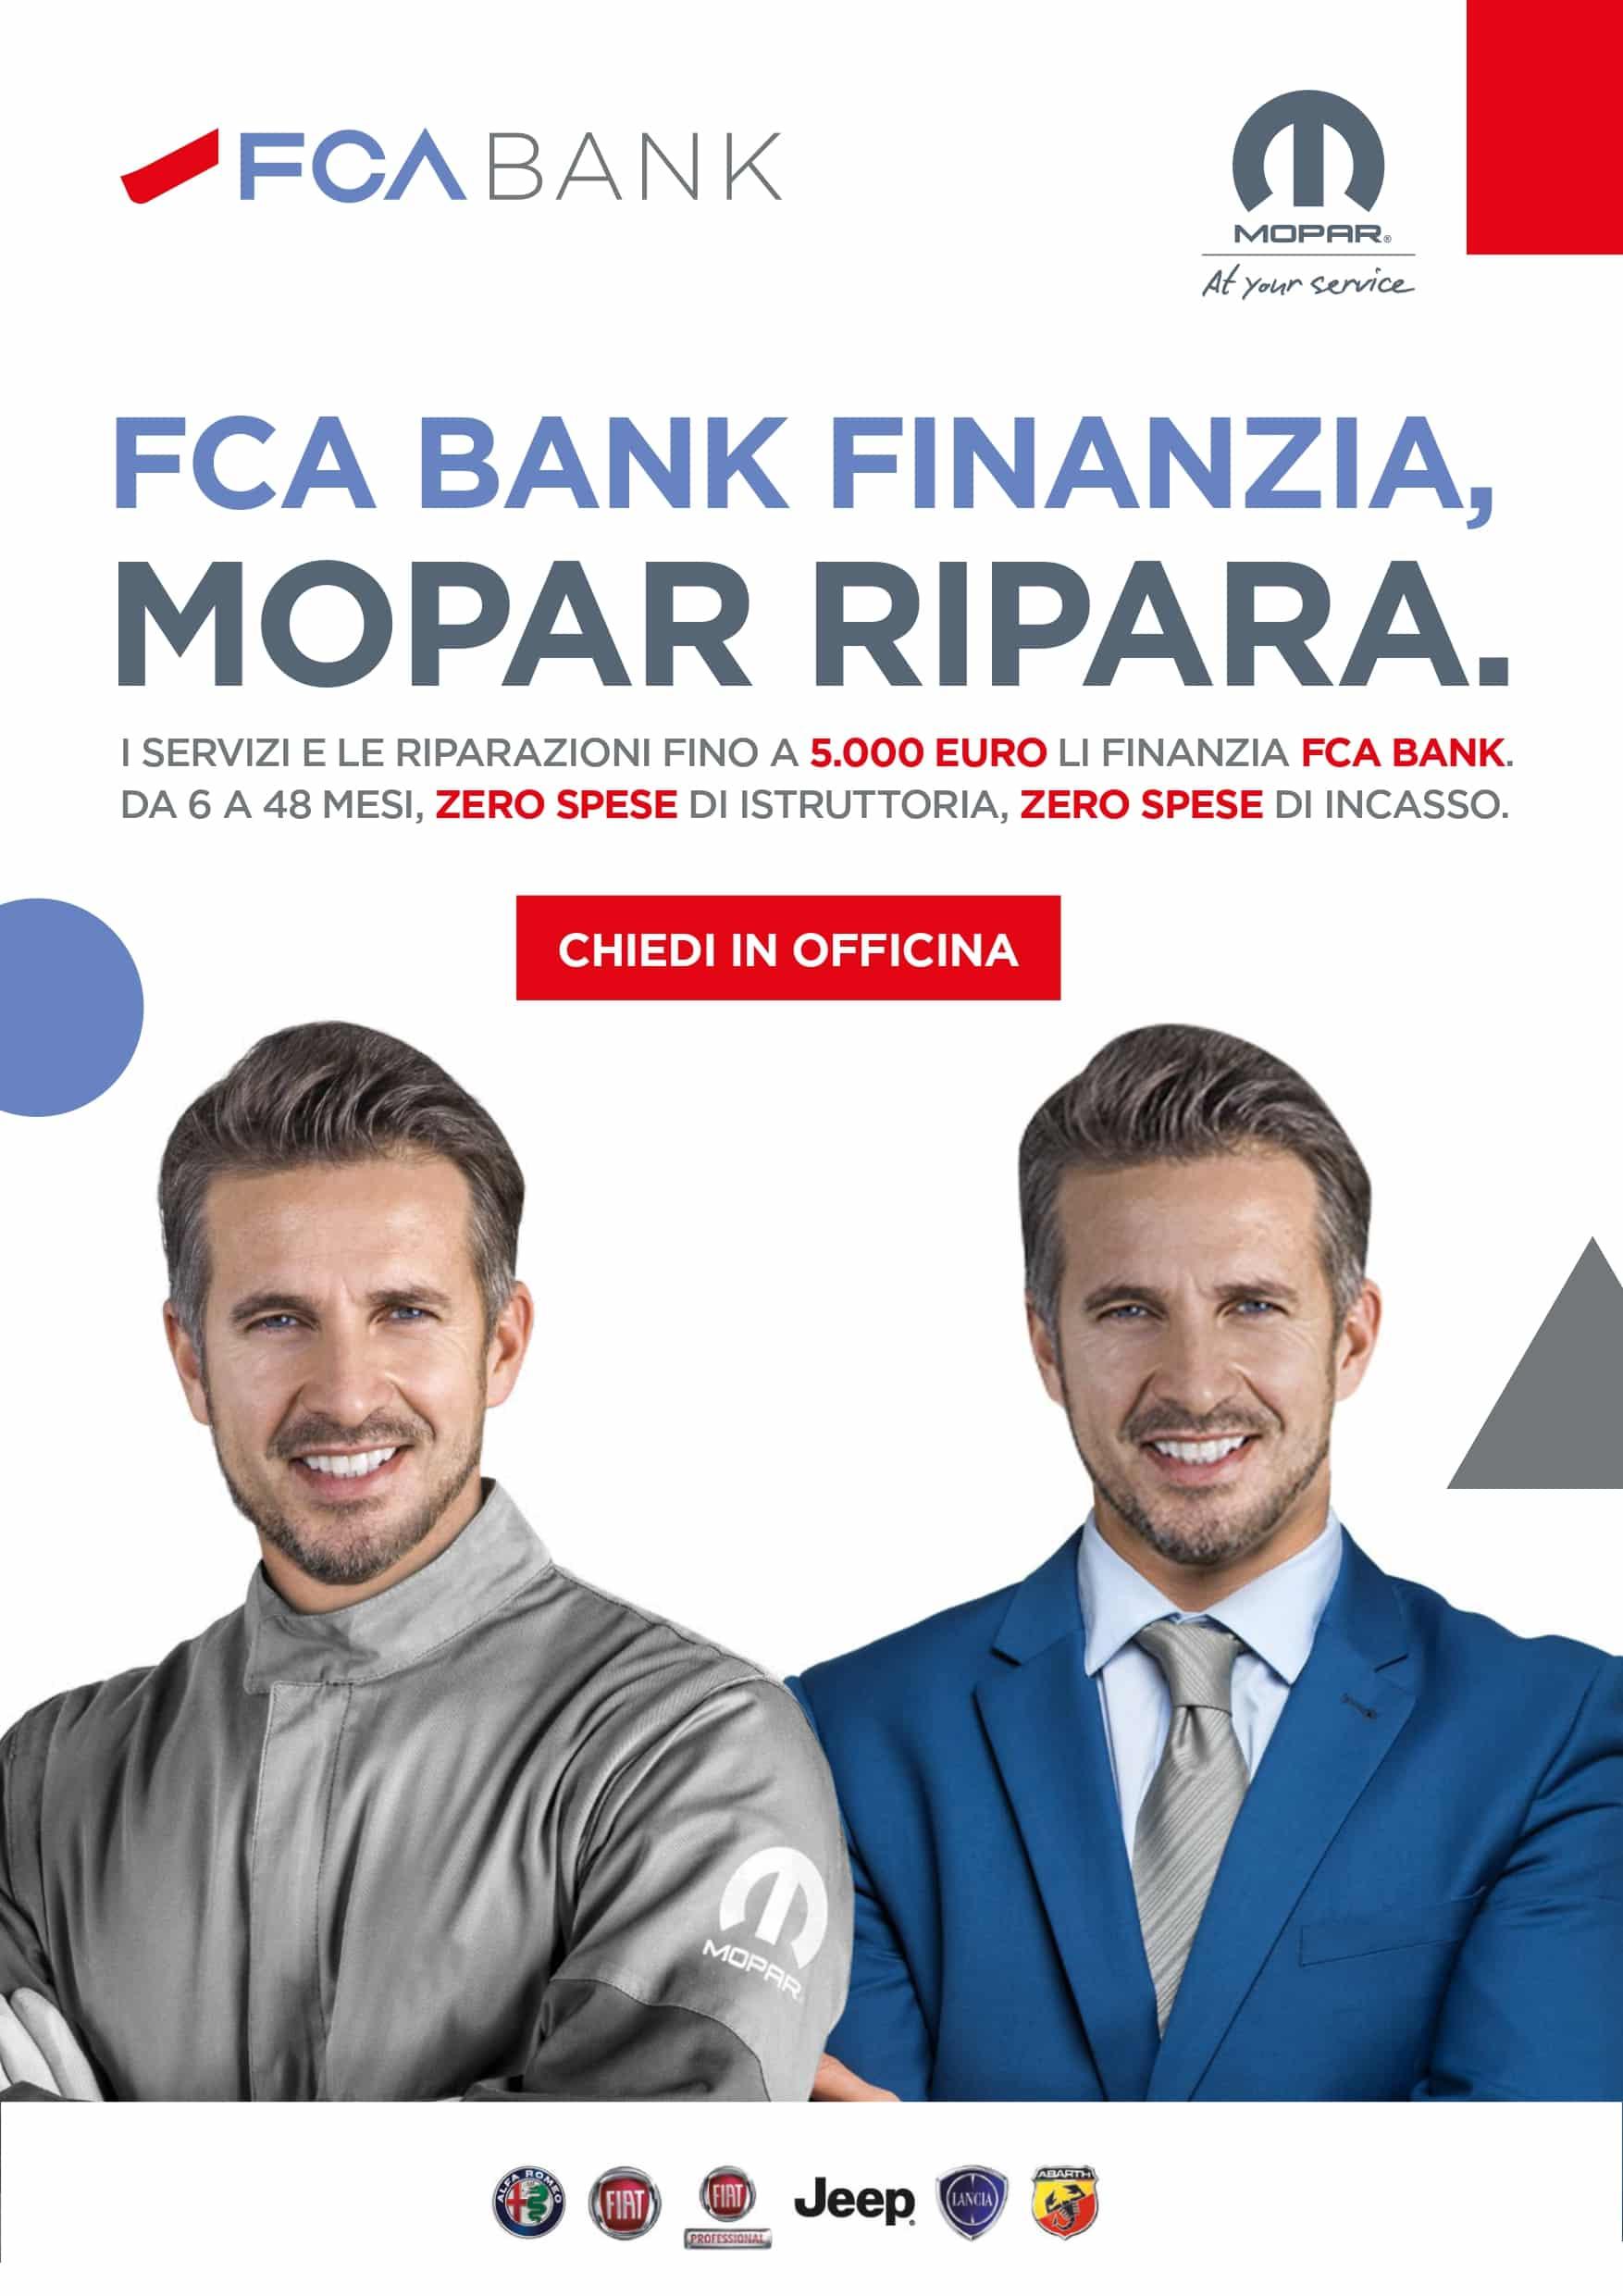 fca-org FCA BANK FINANZIA I SERVIZI MOPAR